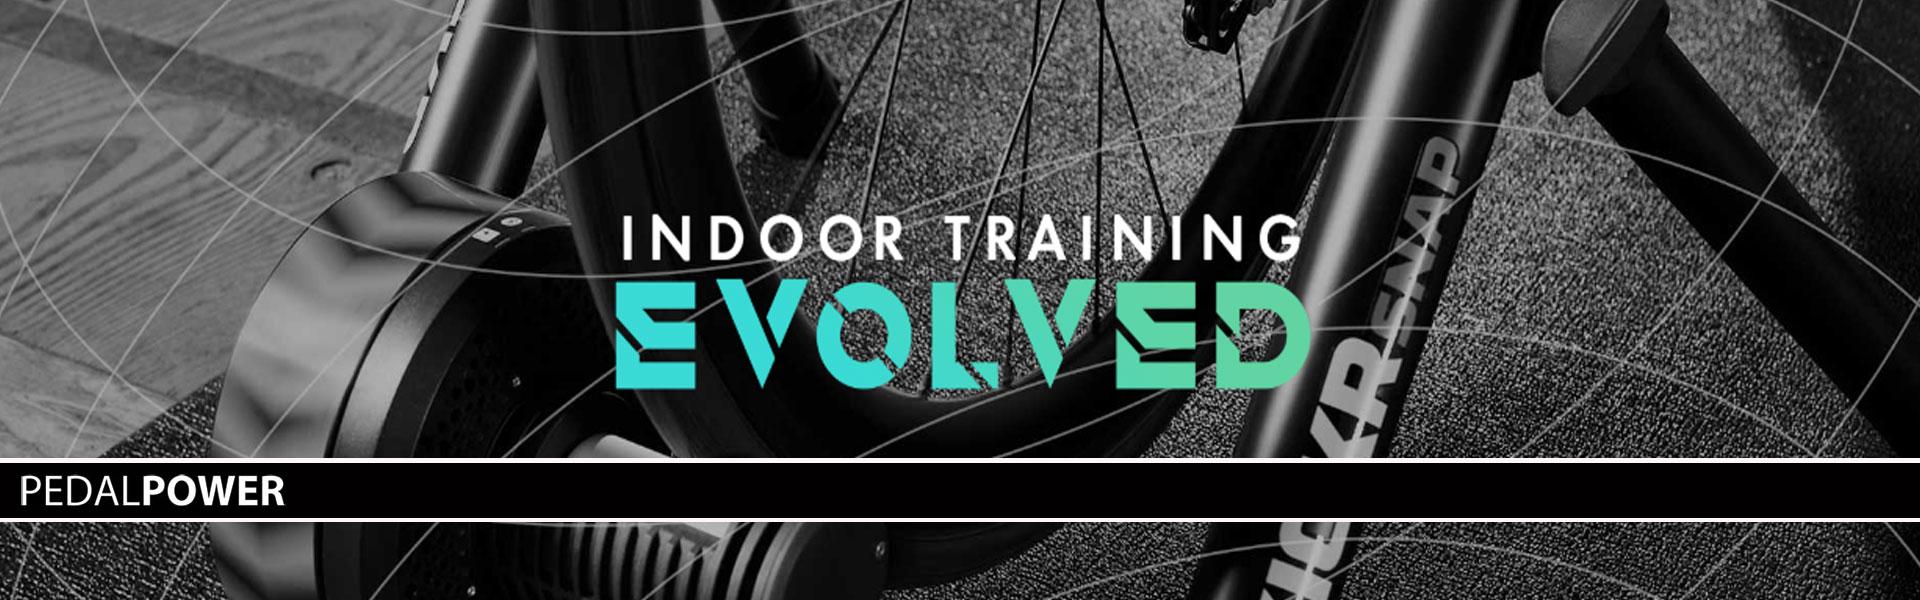 Pedal Power: Bike Trainers Wahoo Fitness